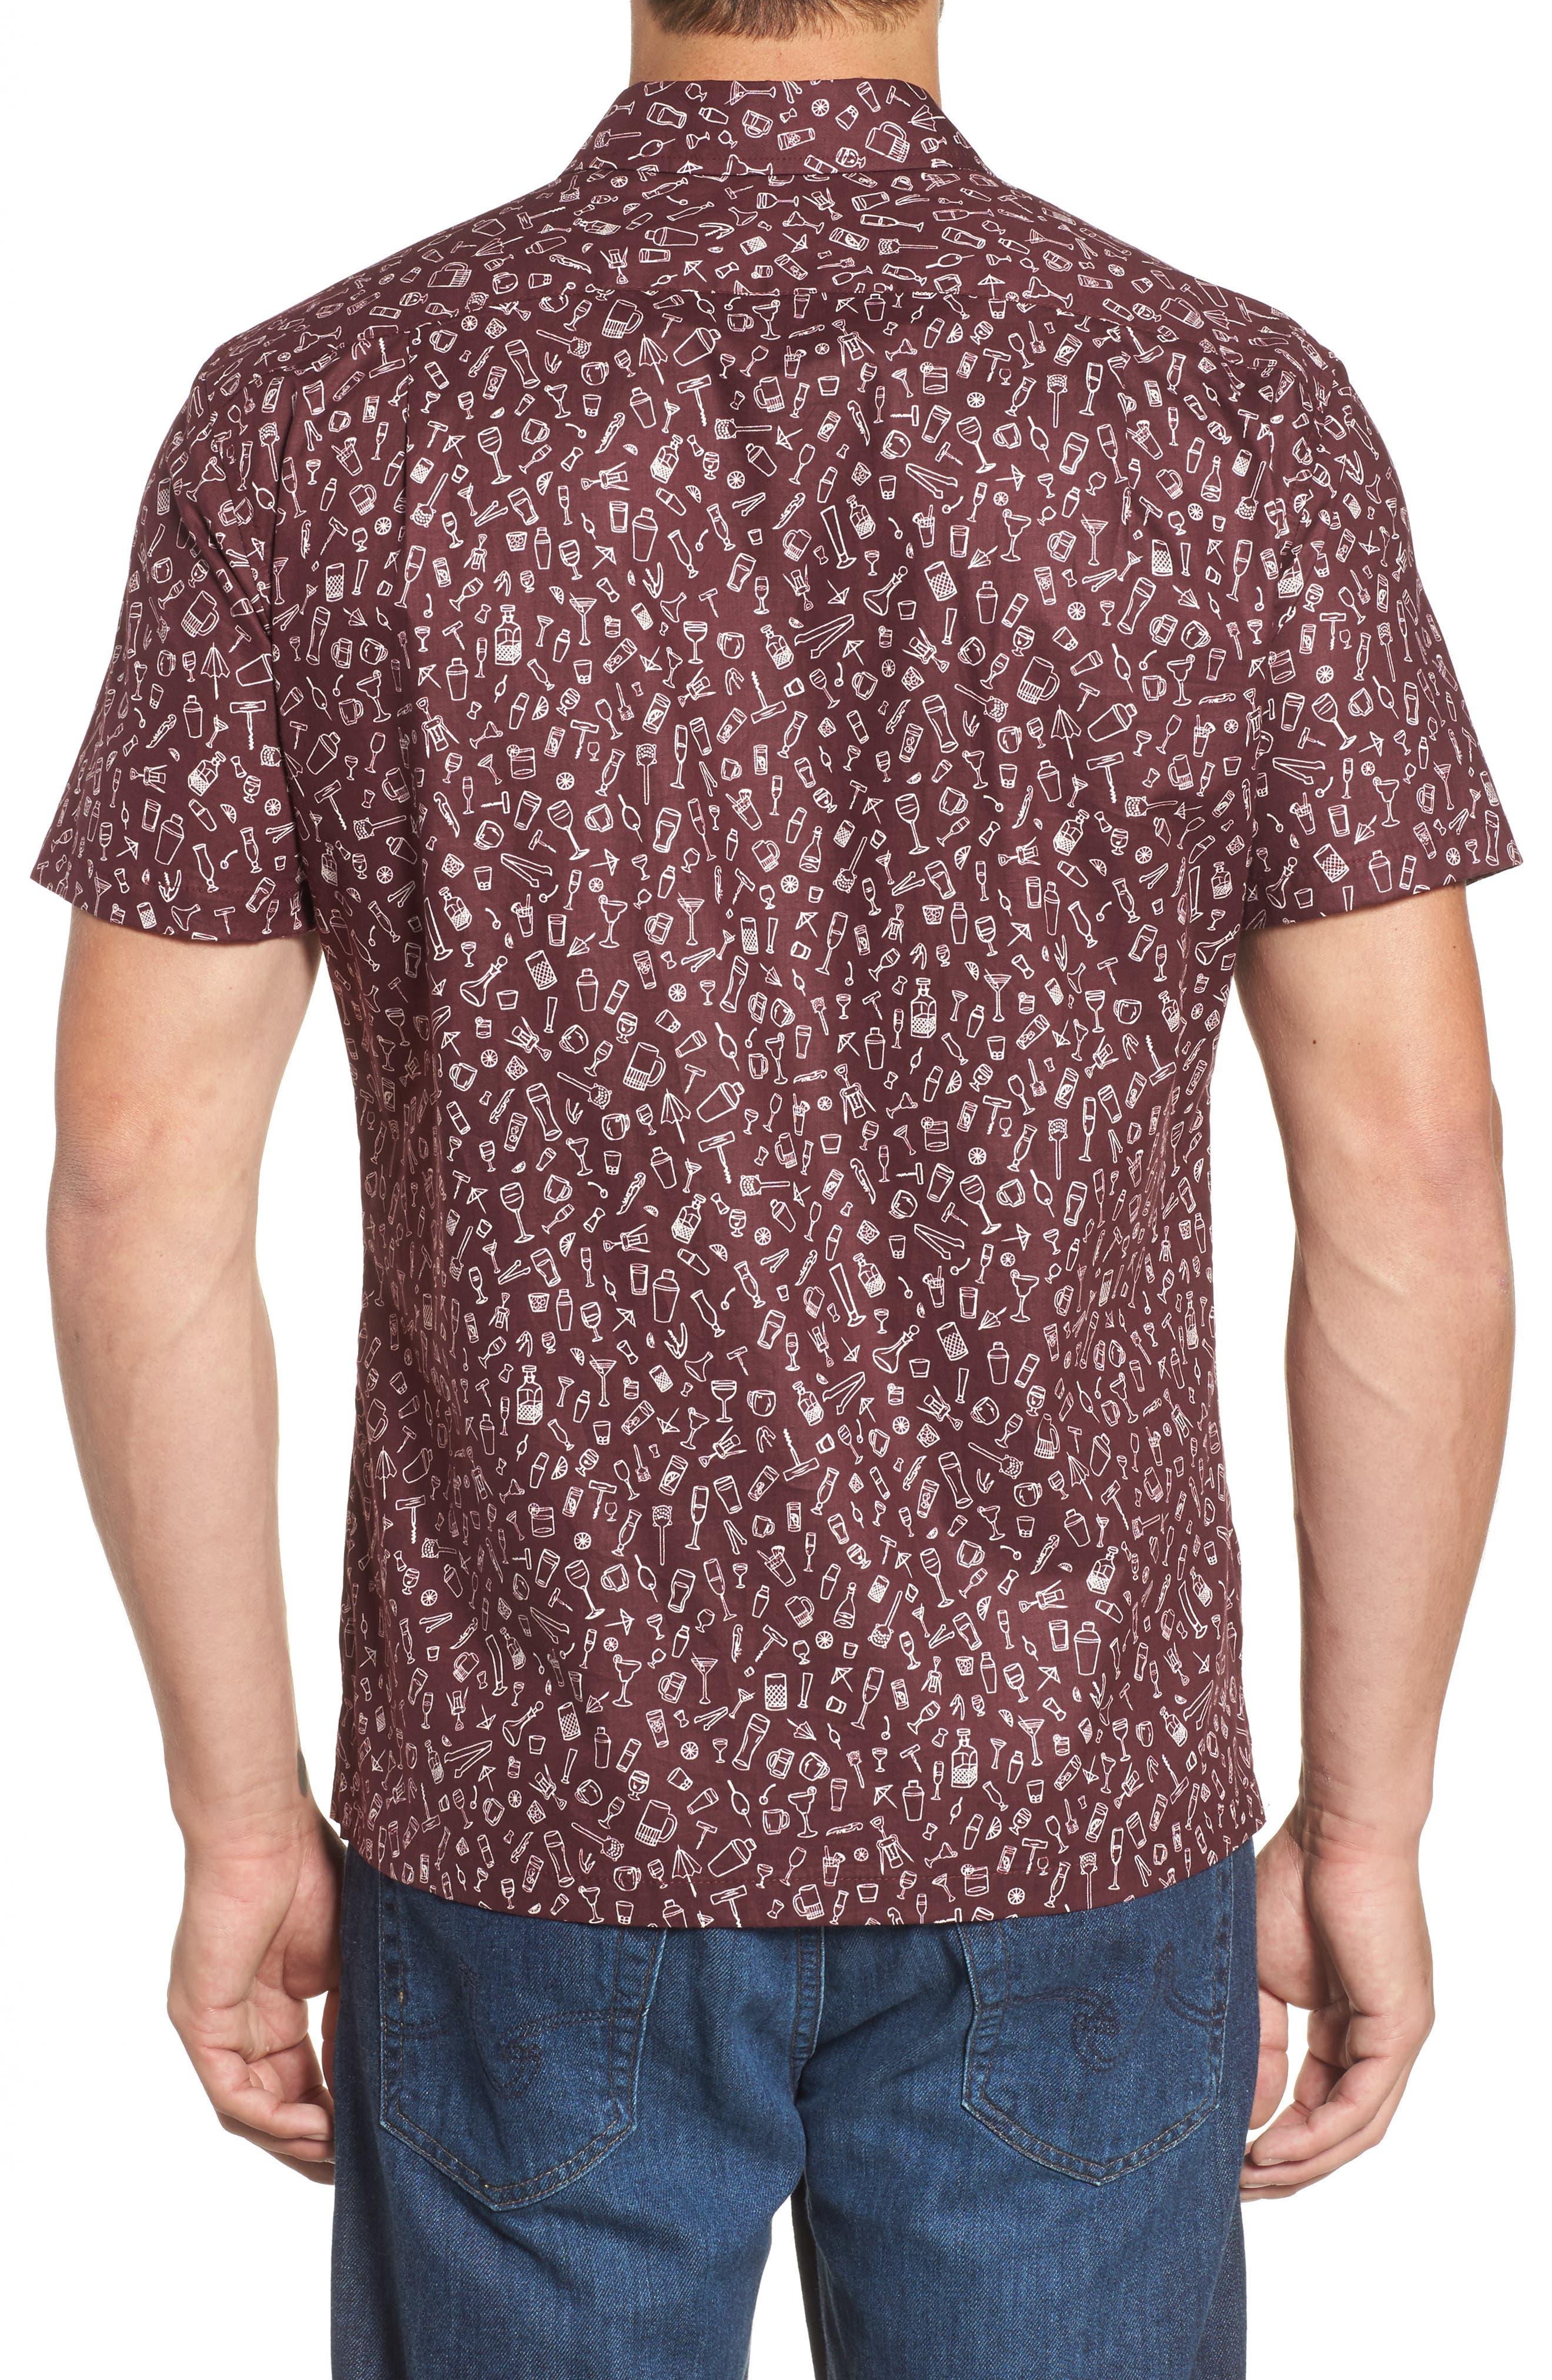 5 PM Slim Fit Camp Shirt,                             Alternate thumbnail 2, color,                             Wine